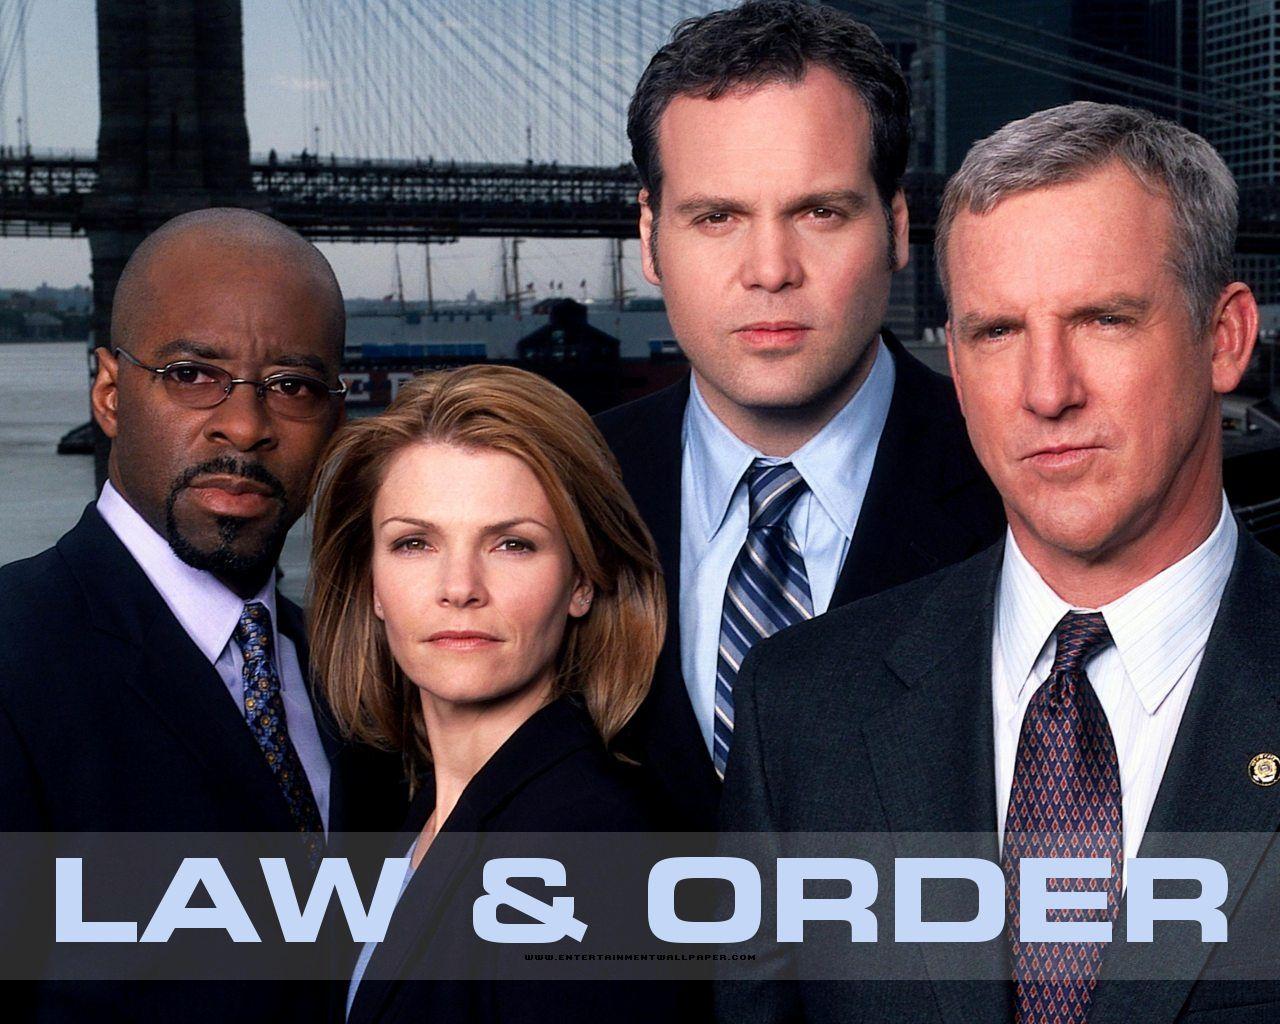 tv_law_order